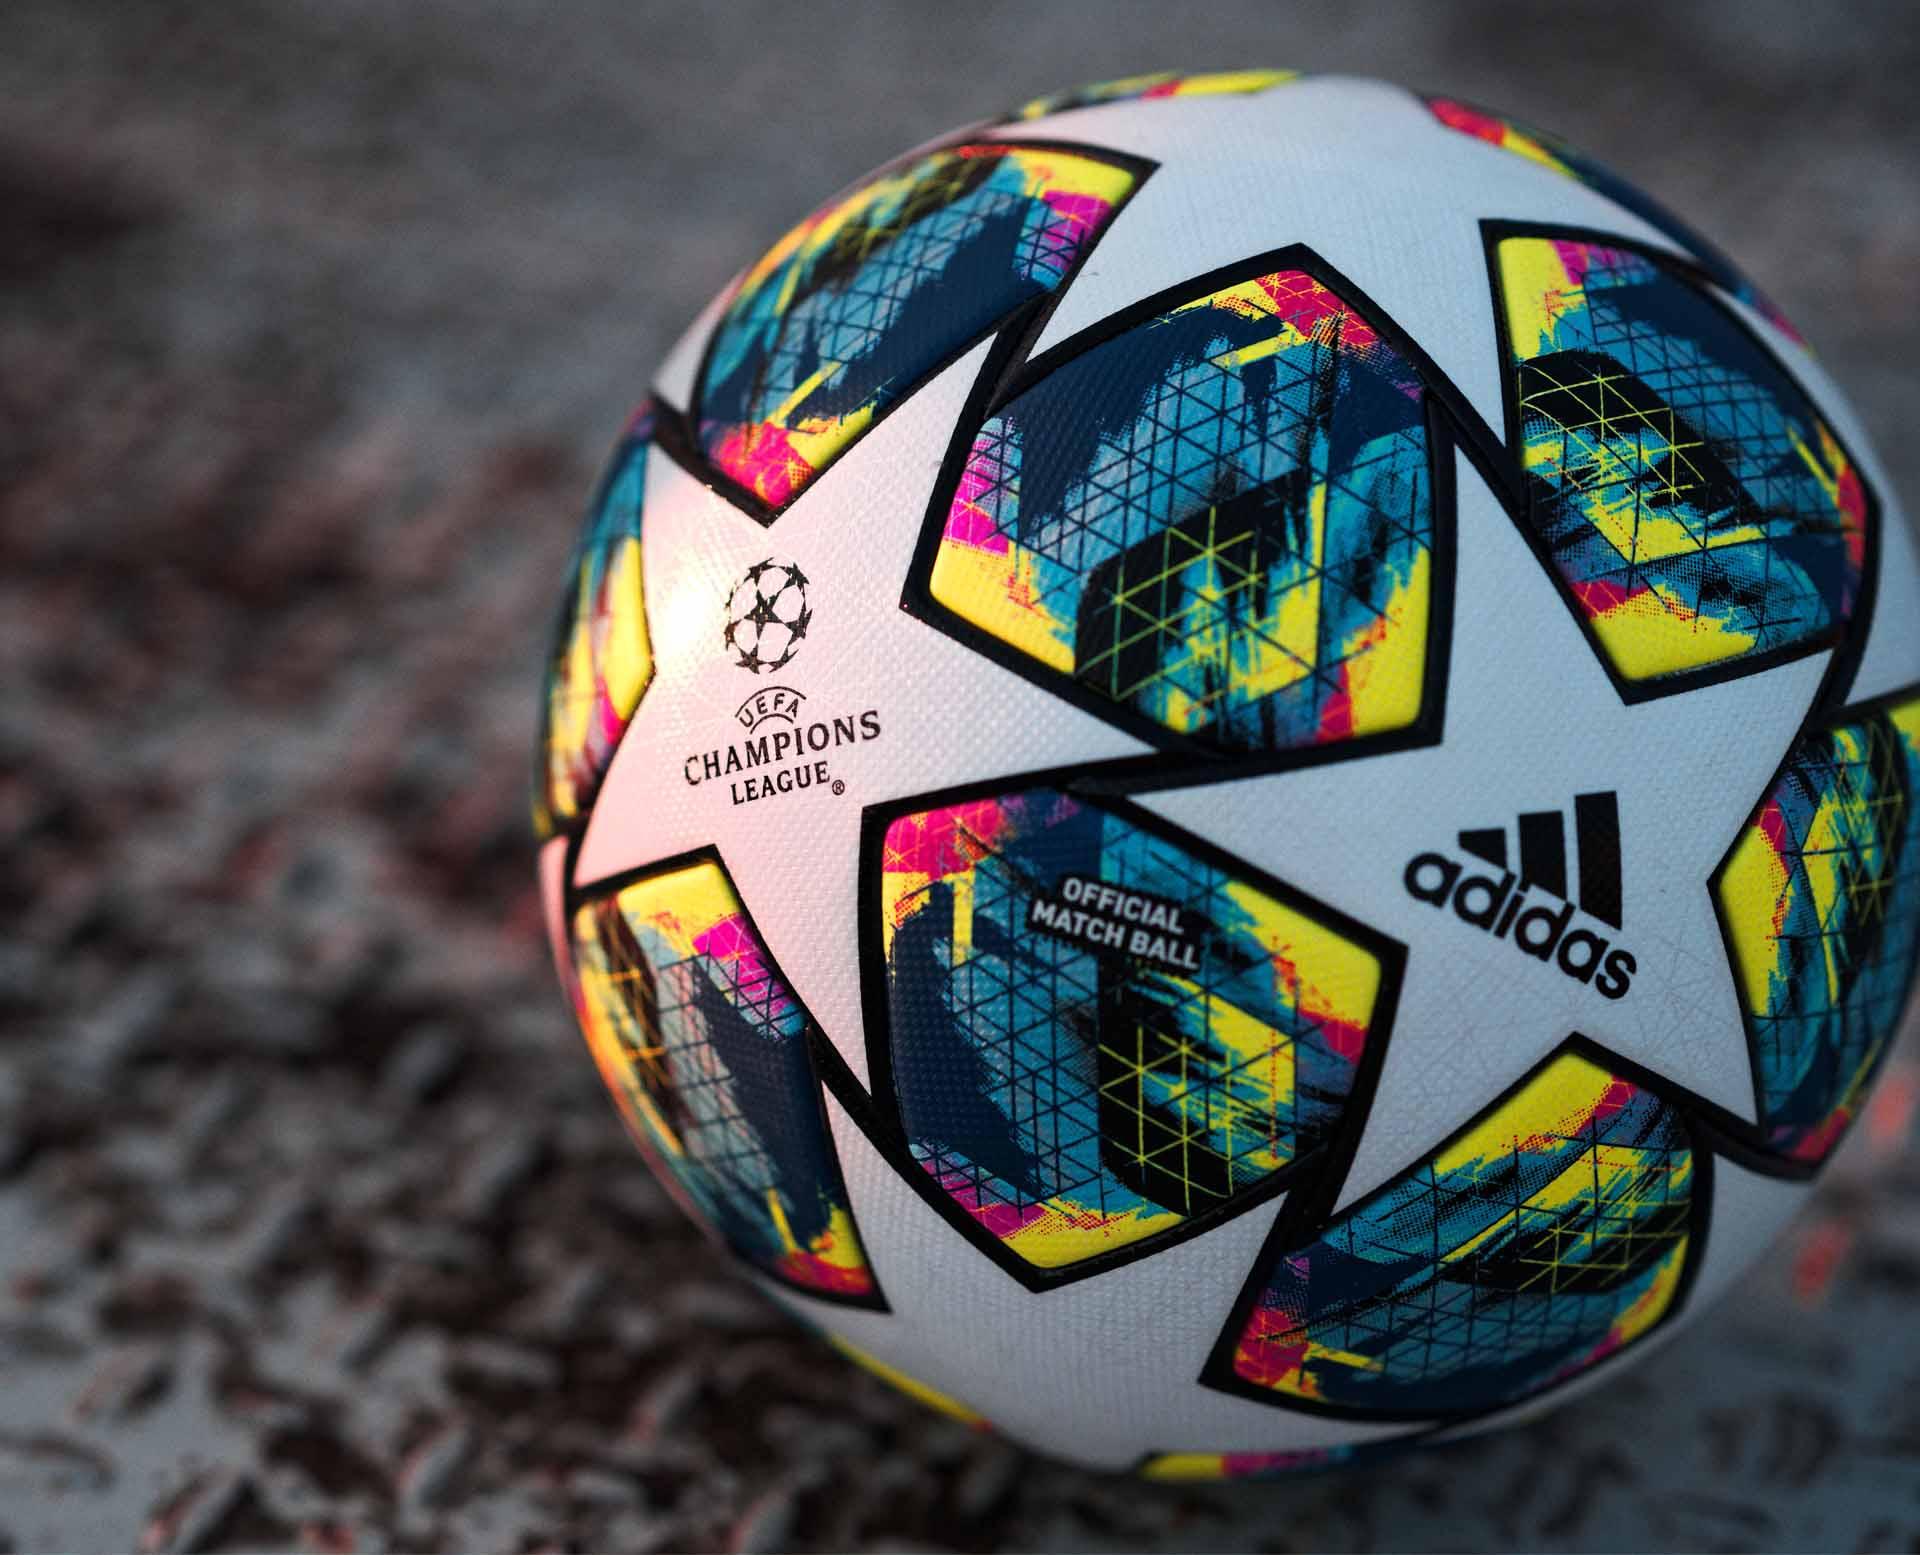 adidas præsenterer 2019/20 Champions League fodbold 2